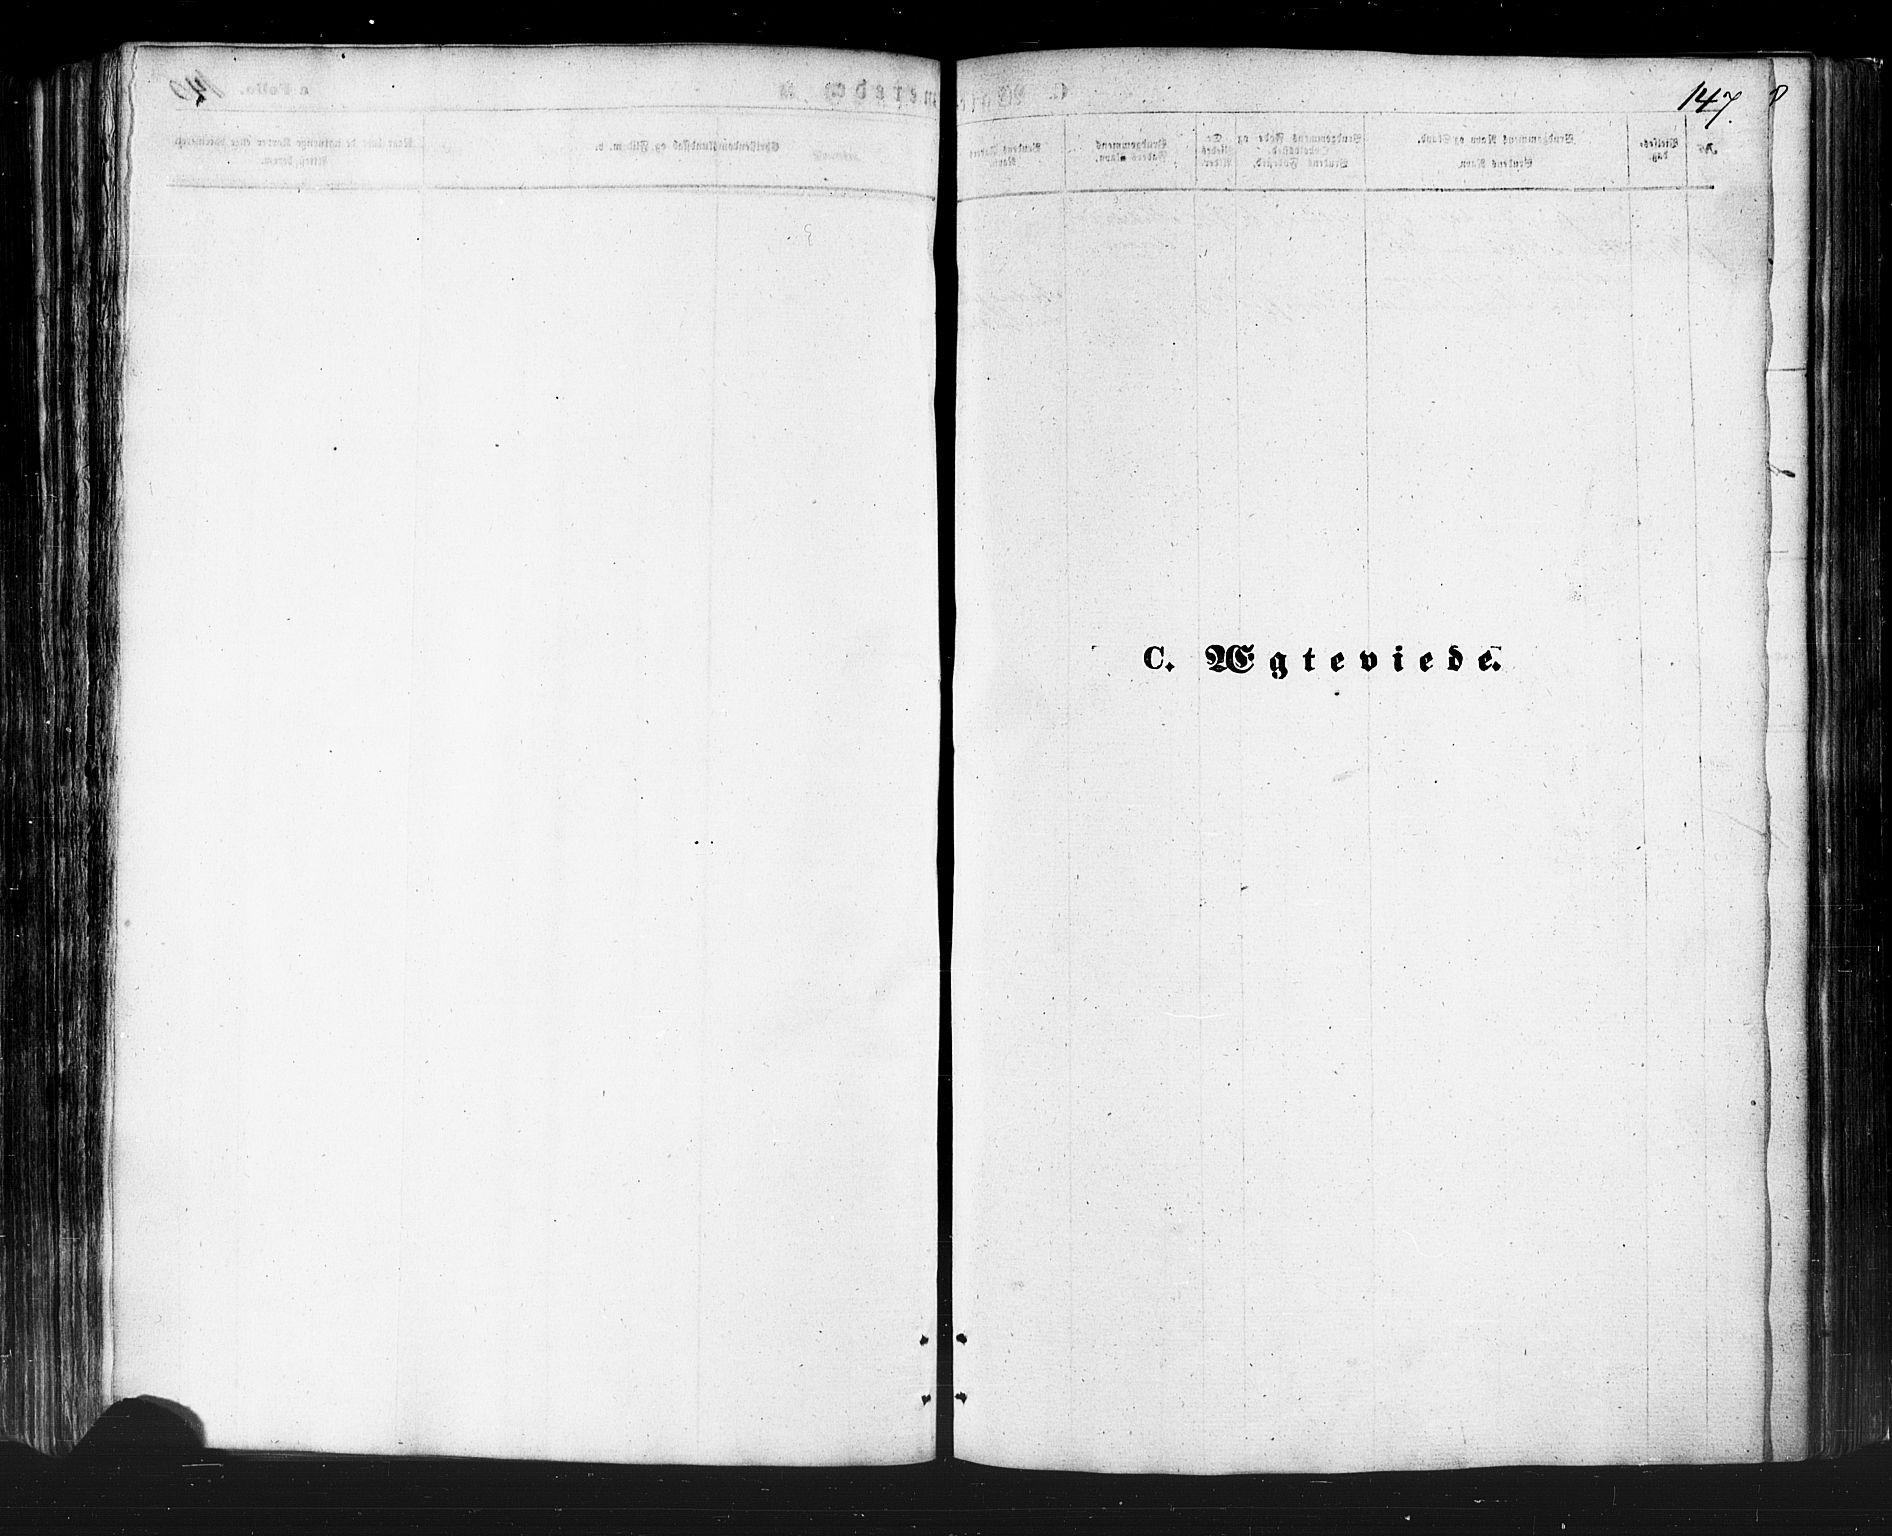 SATØ, Karasjok sokneprestkontor, H/Ha/L0001kirke: Ministerialbok nr. 1, 1872-1884, s. 147